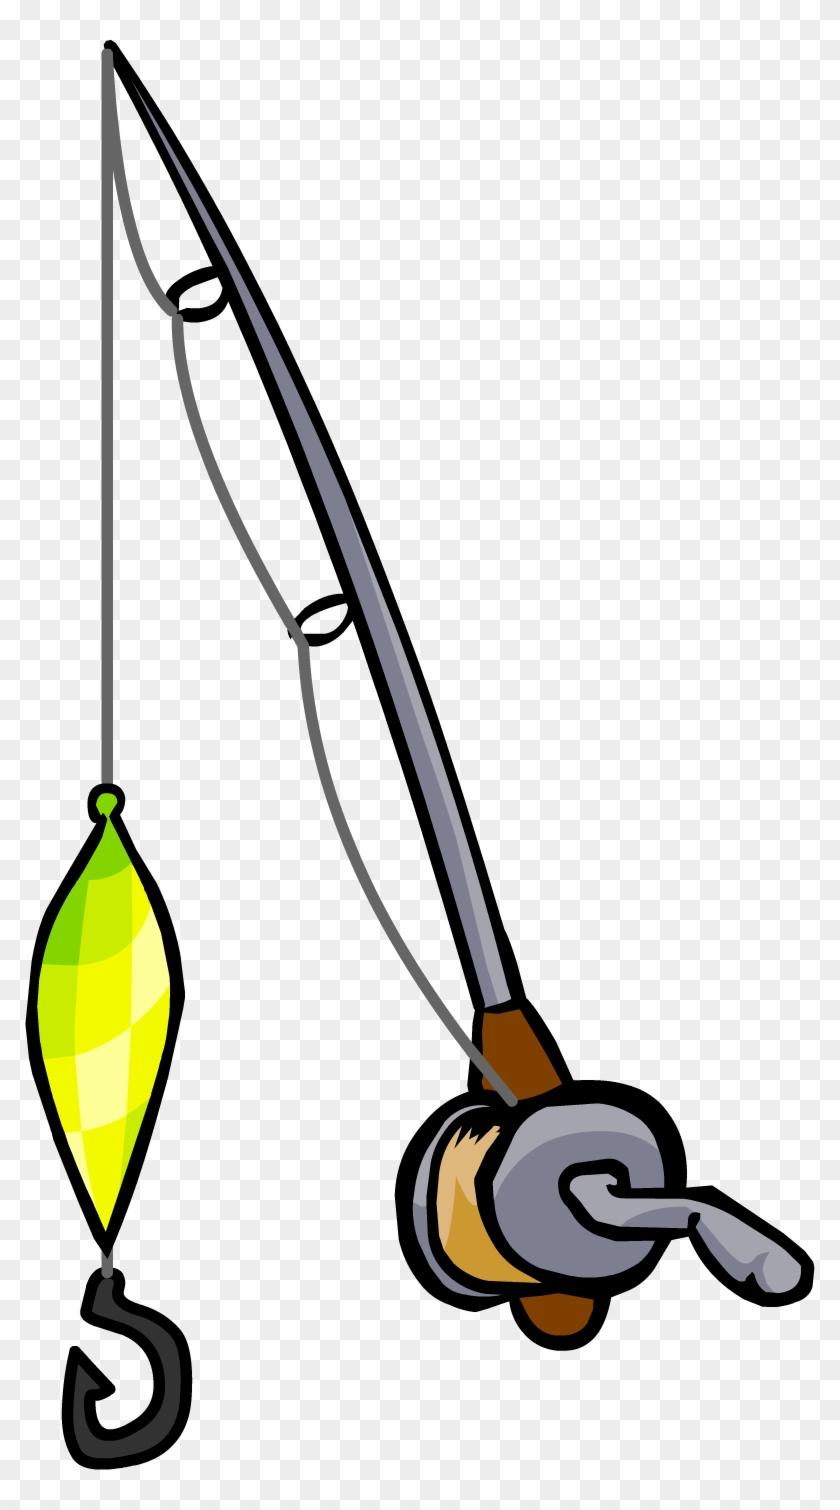 Flashing Lure Fishing Rod - Fishing Pole And Lure #392805